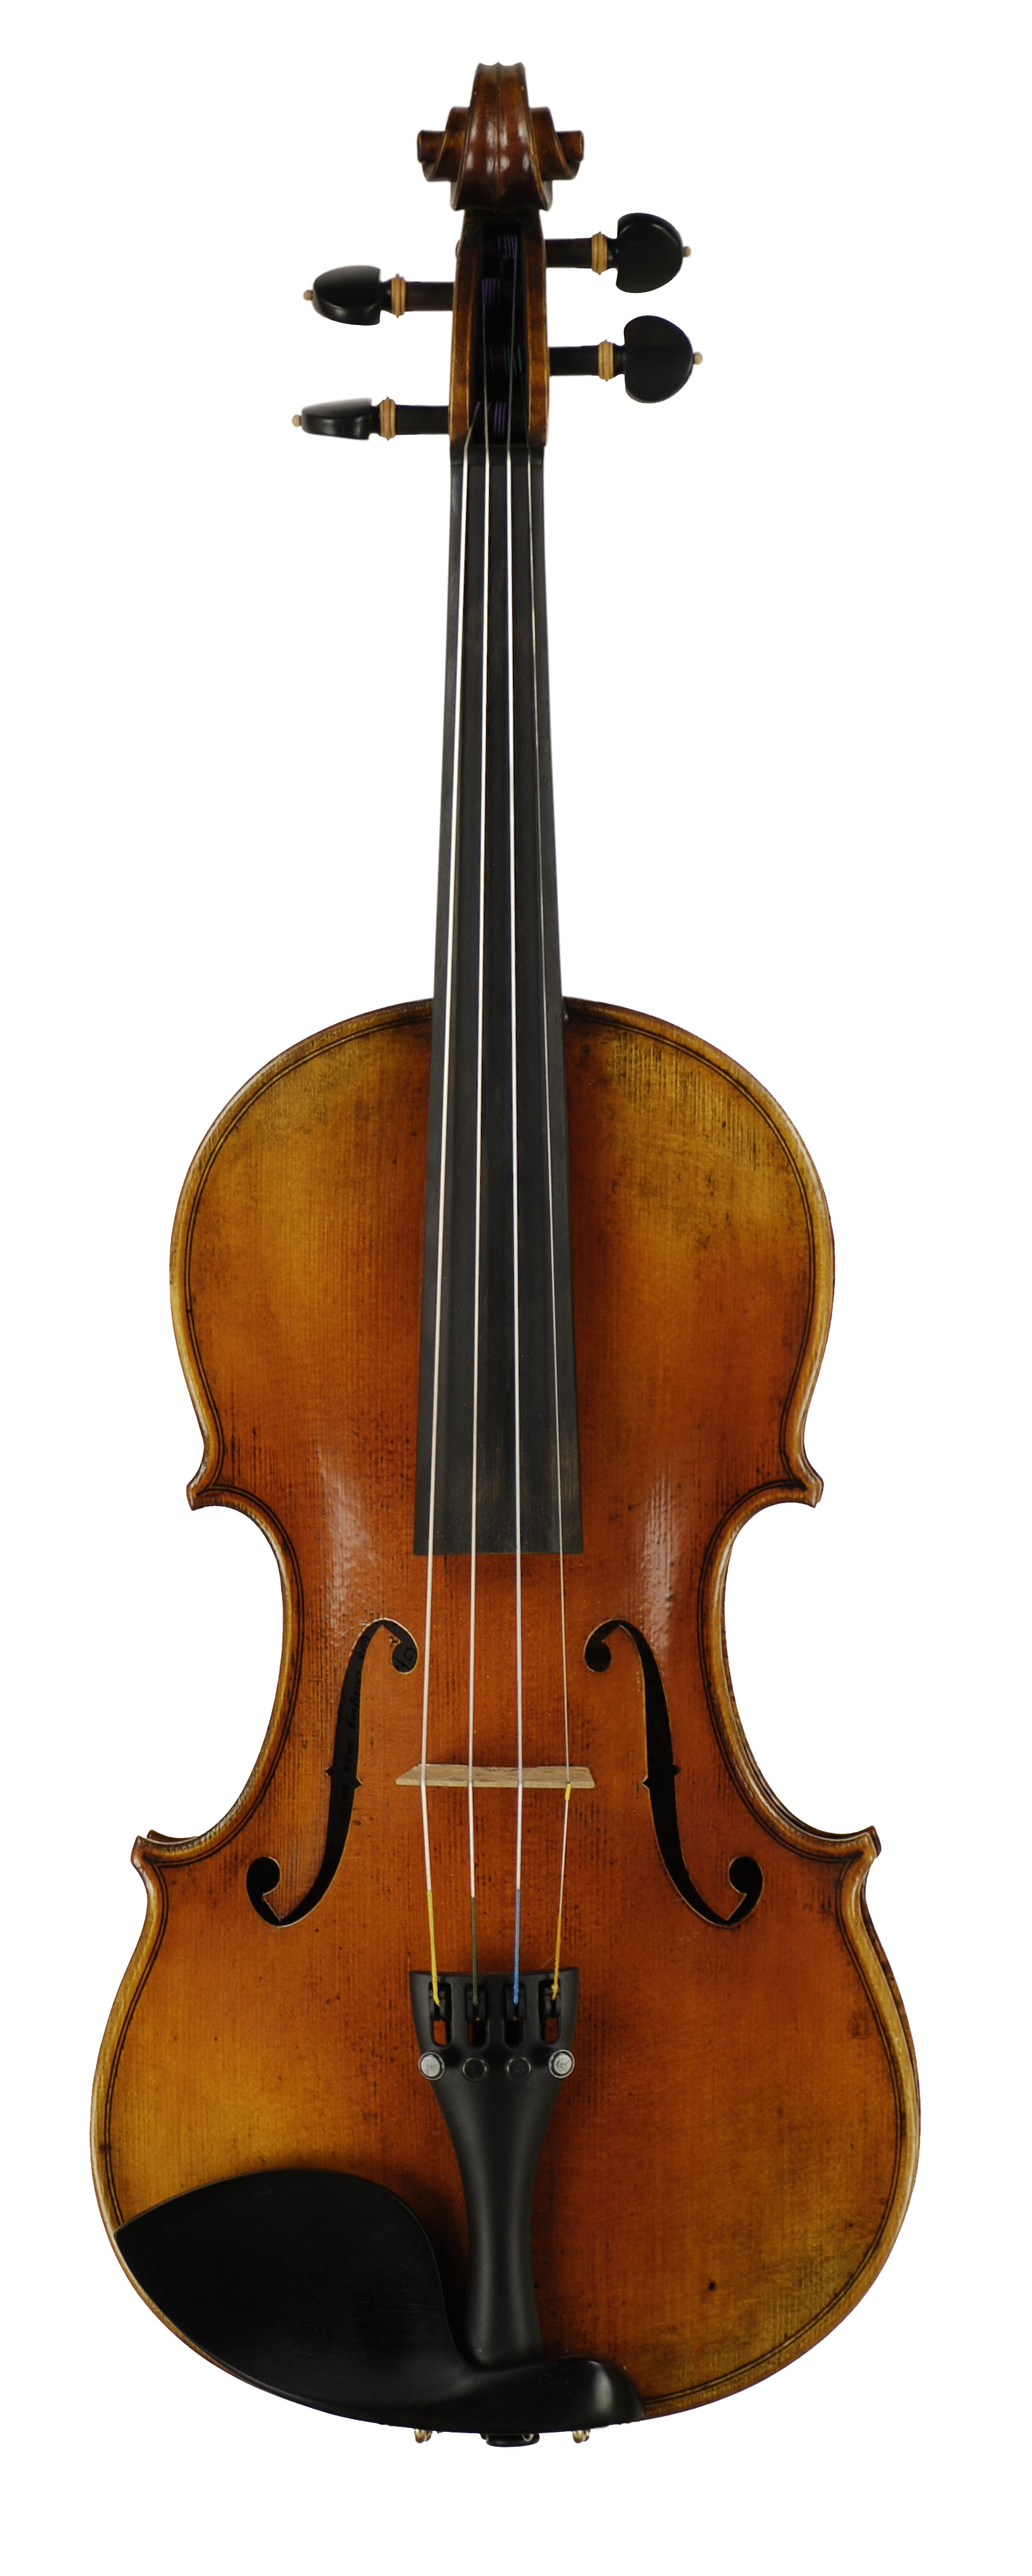 Zhenjie Zhao Cedar Music Model 140 | J.R. Judd Violins